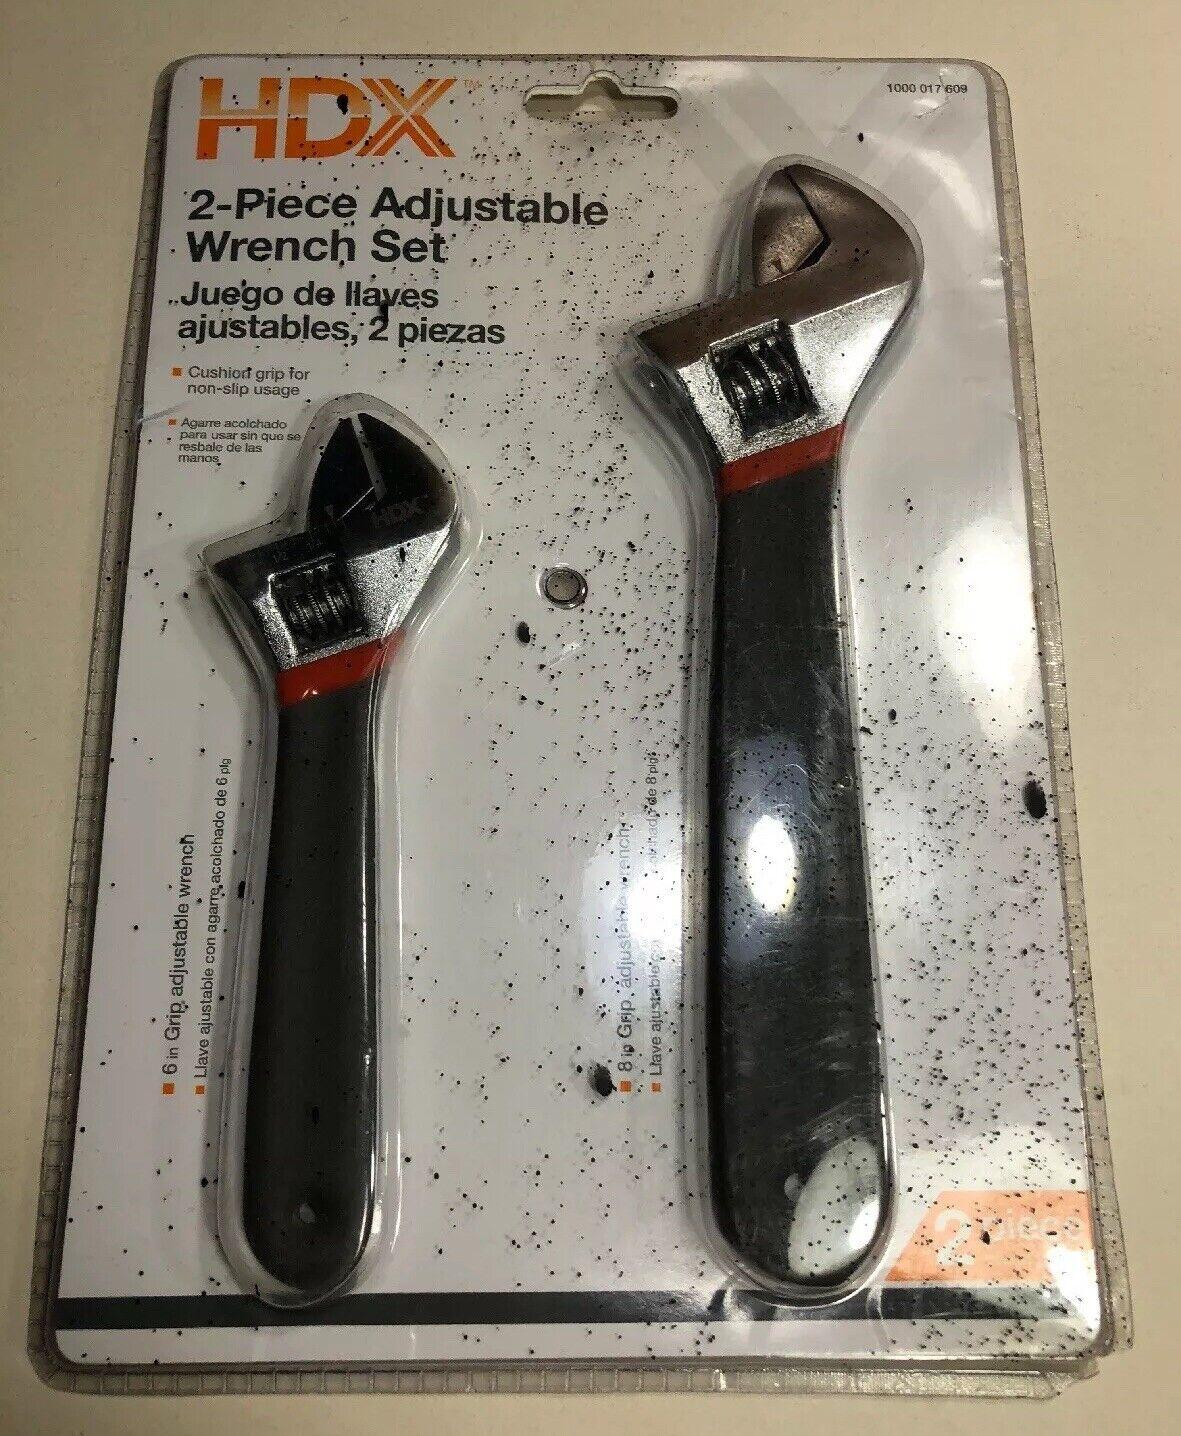 2 Piece HDX Adjustable Wrench Set 6  & 8  Non-Slip Handles (new)